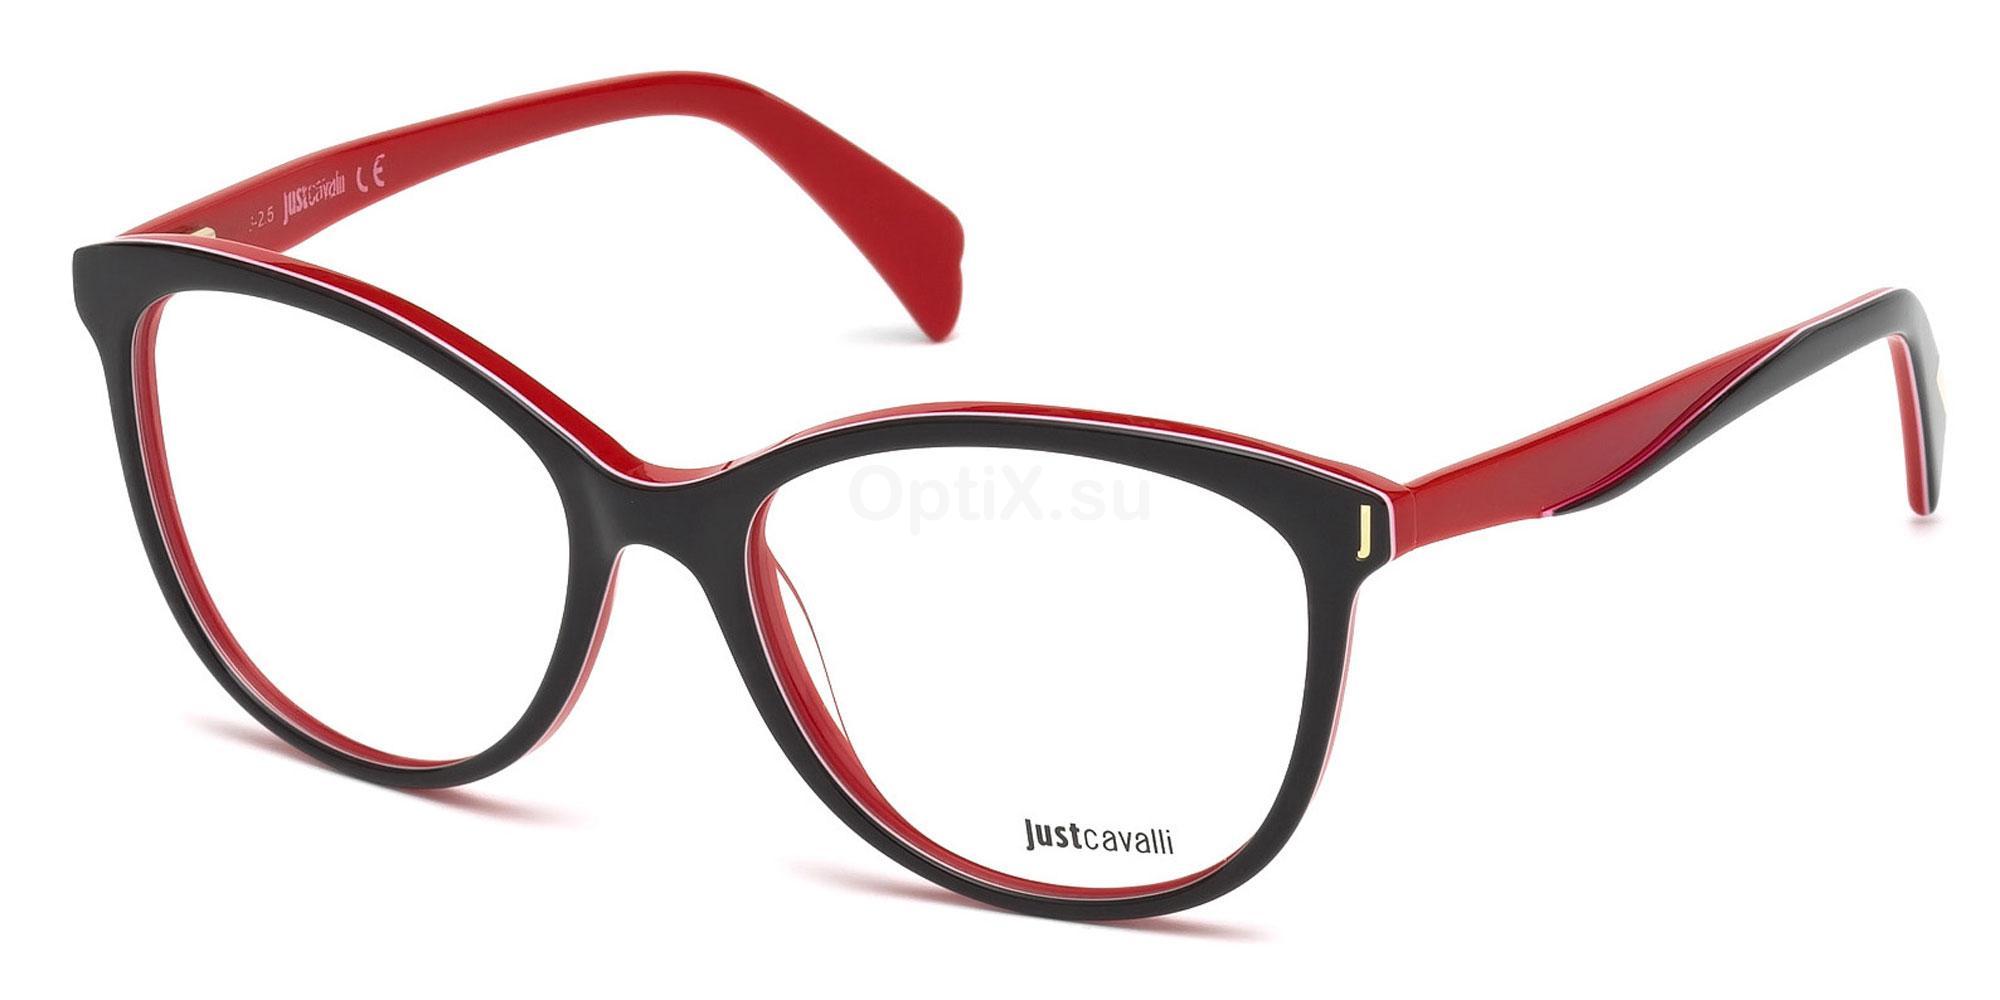 005 JC0773 Glasses, Just Cavalli